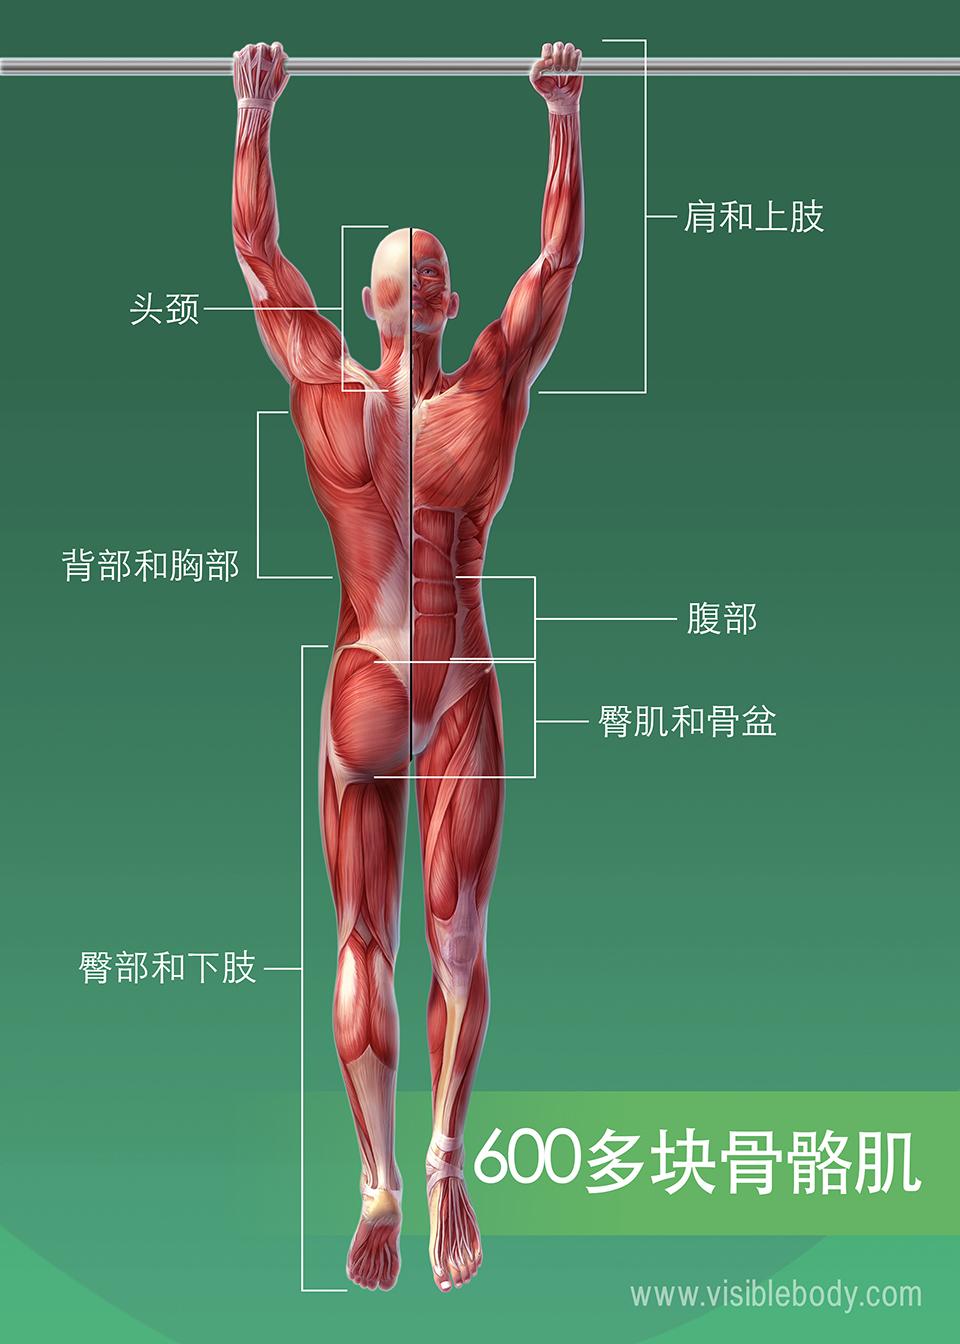 3B-600+-骨骼肌